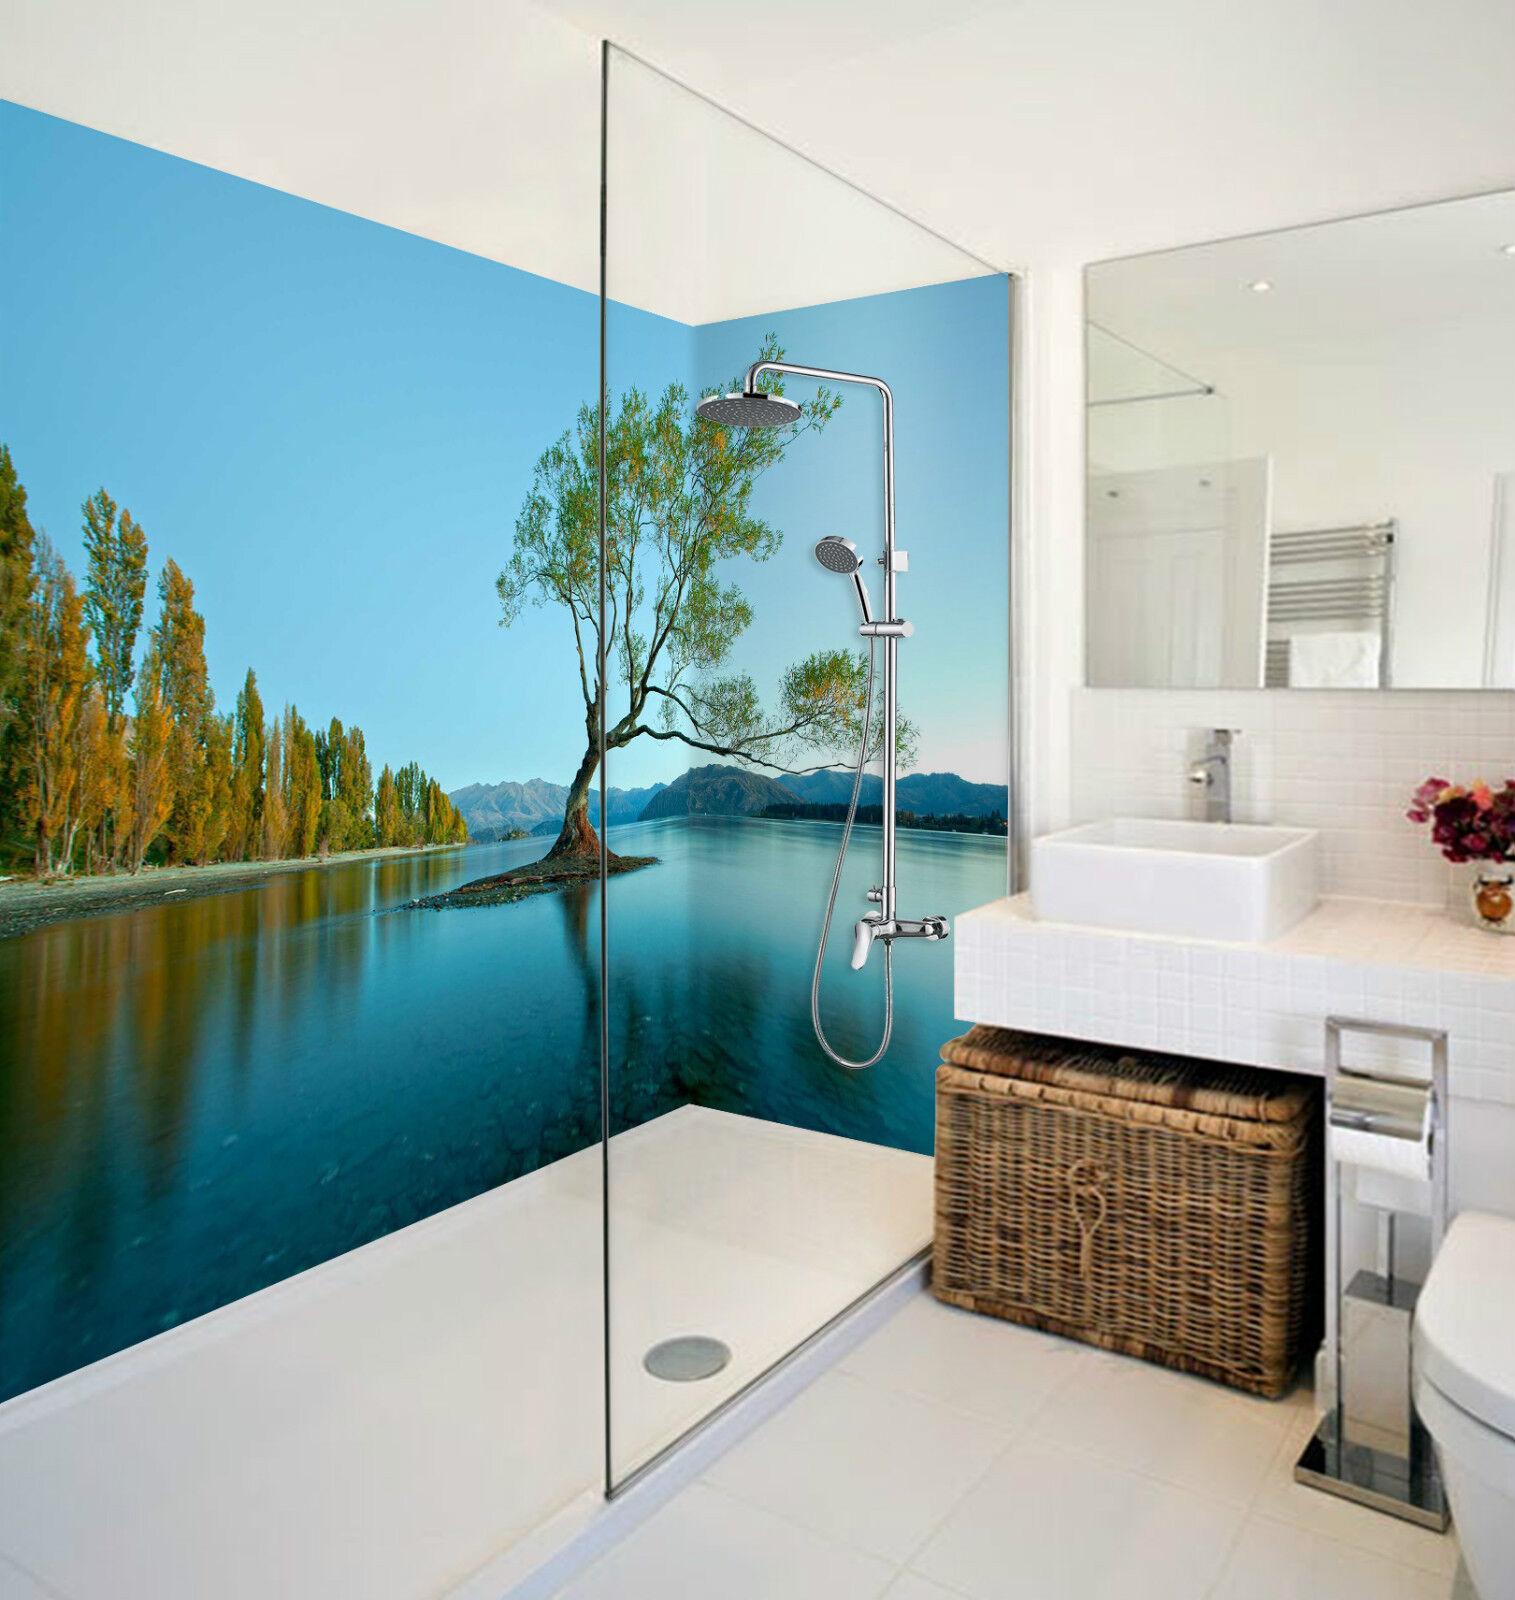 3D bluee Lake Tree 150 WallPaper Bathroom Print Decal Wall Deco AJ WALLPAPER CA